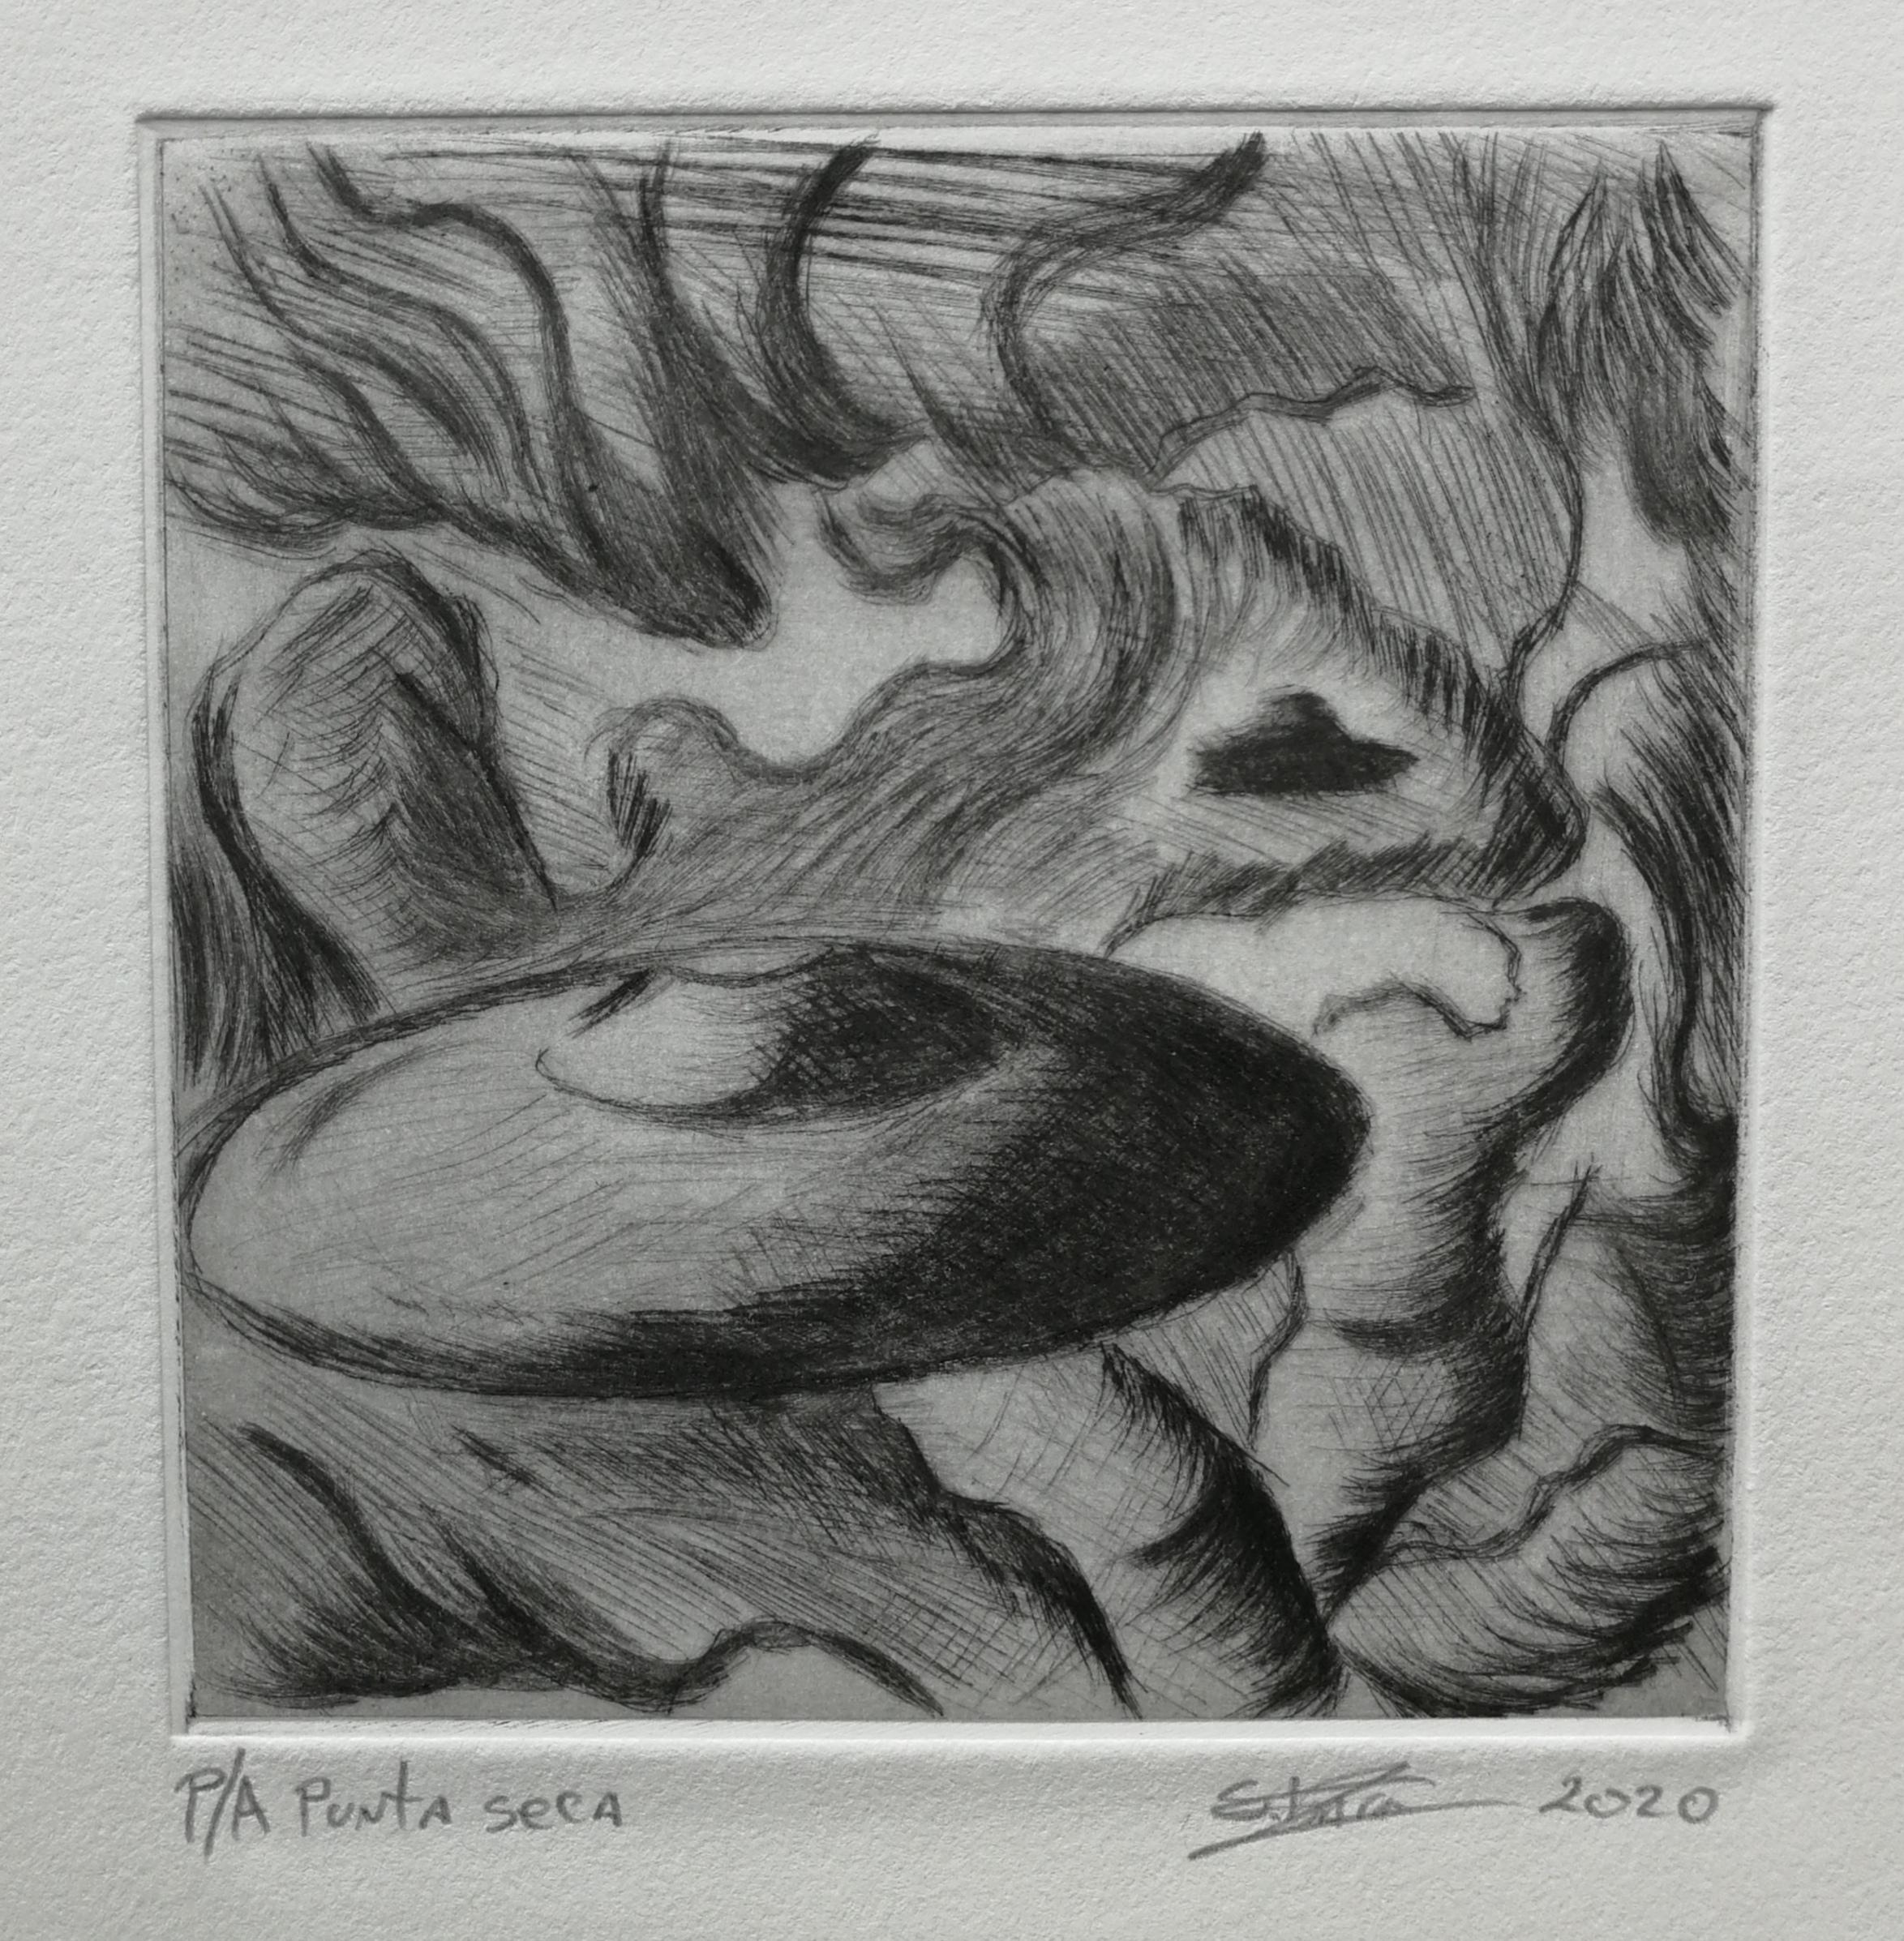 Grabado en metal punta seca por Sebastian Barra (10x10 cms)